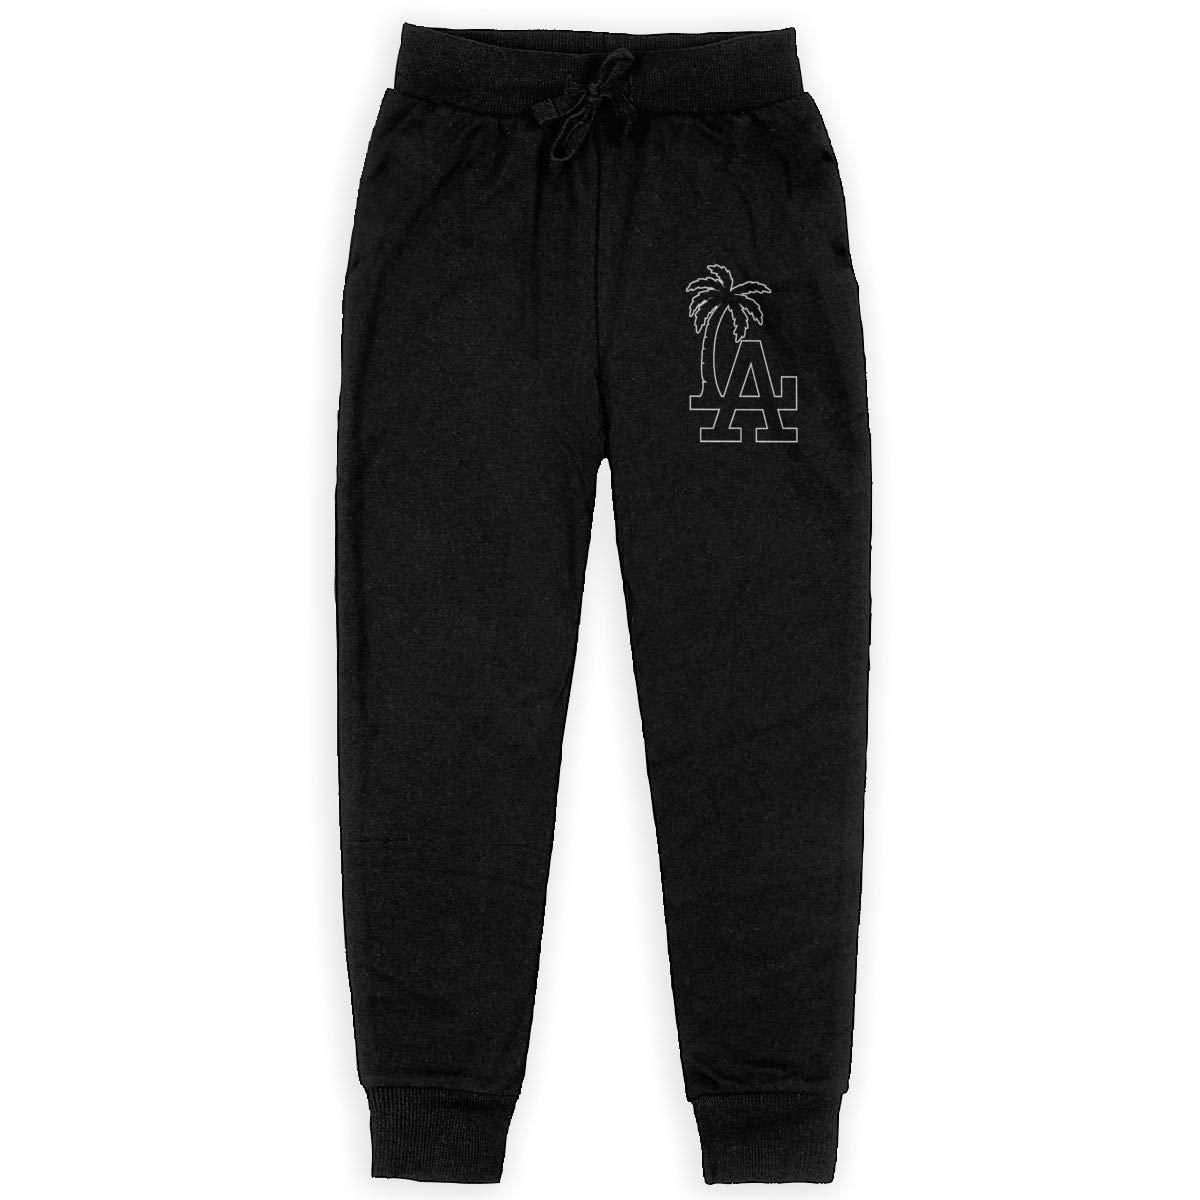 Dunpaiaa Palm Tree LA Boys Sweatpants,Joggers Sport Training Pants Trousers Black